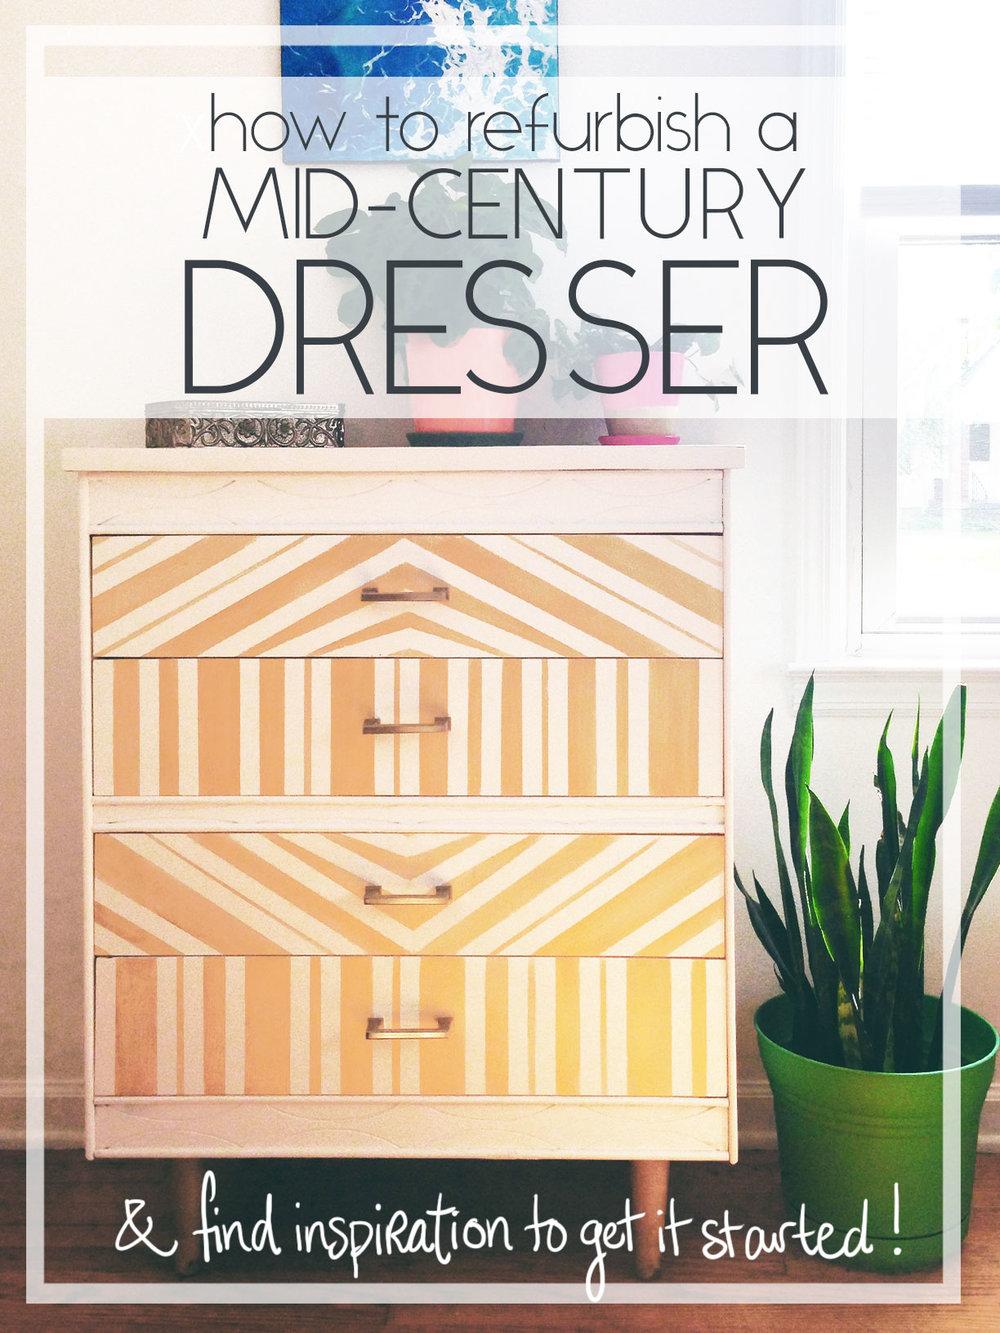 Dresser-Header-Image.jpg